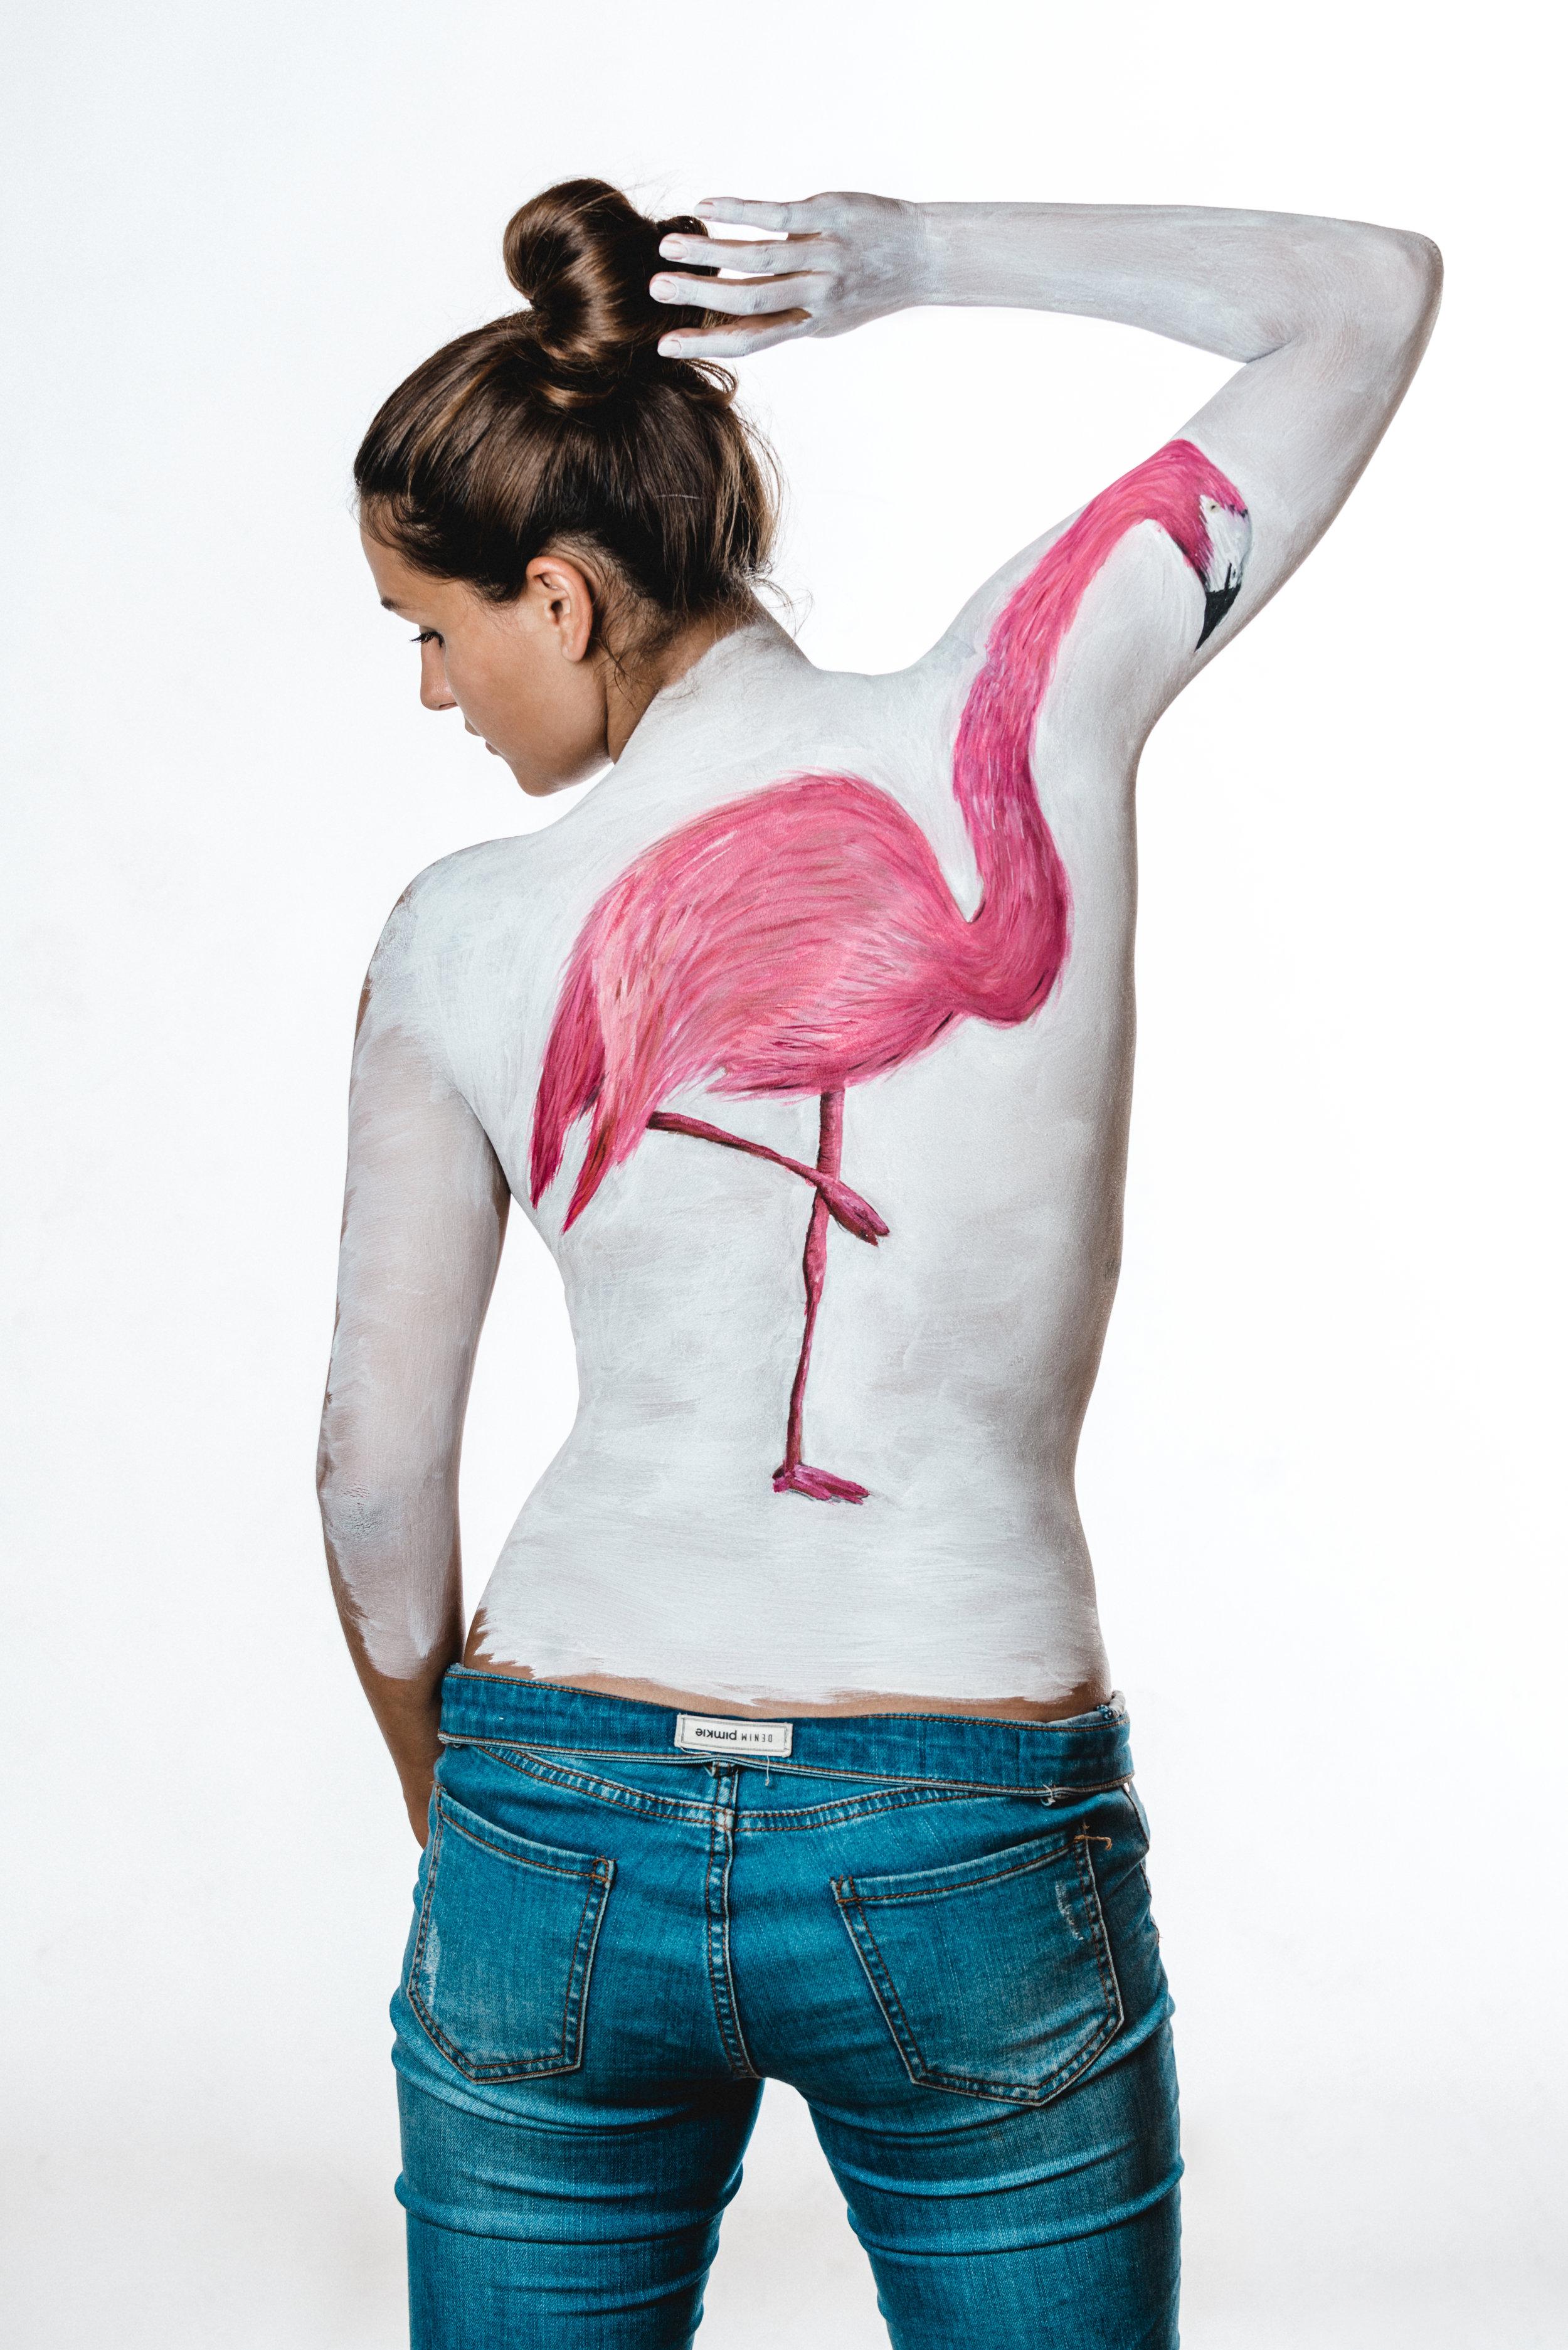 20170711_Bodypaint_Flamingo_14.jpg